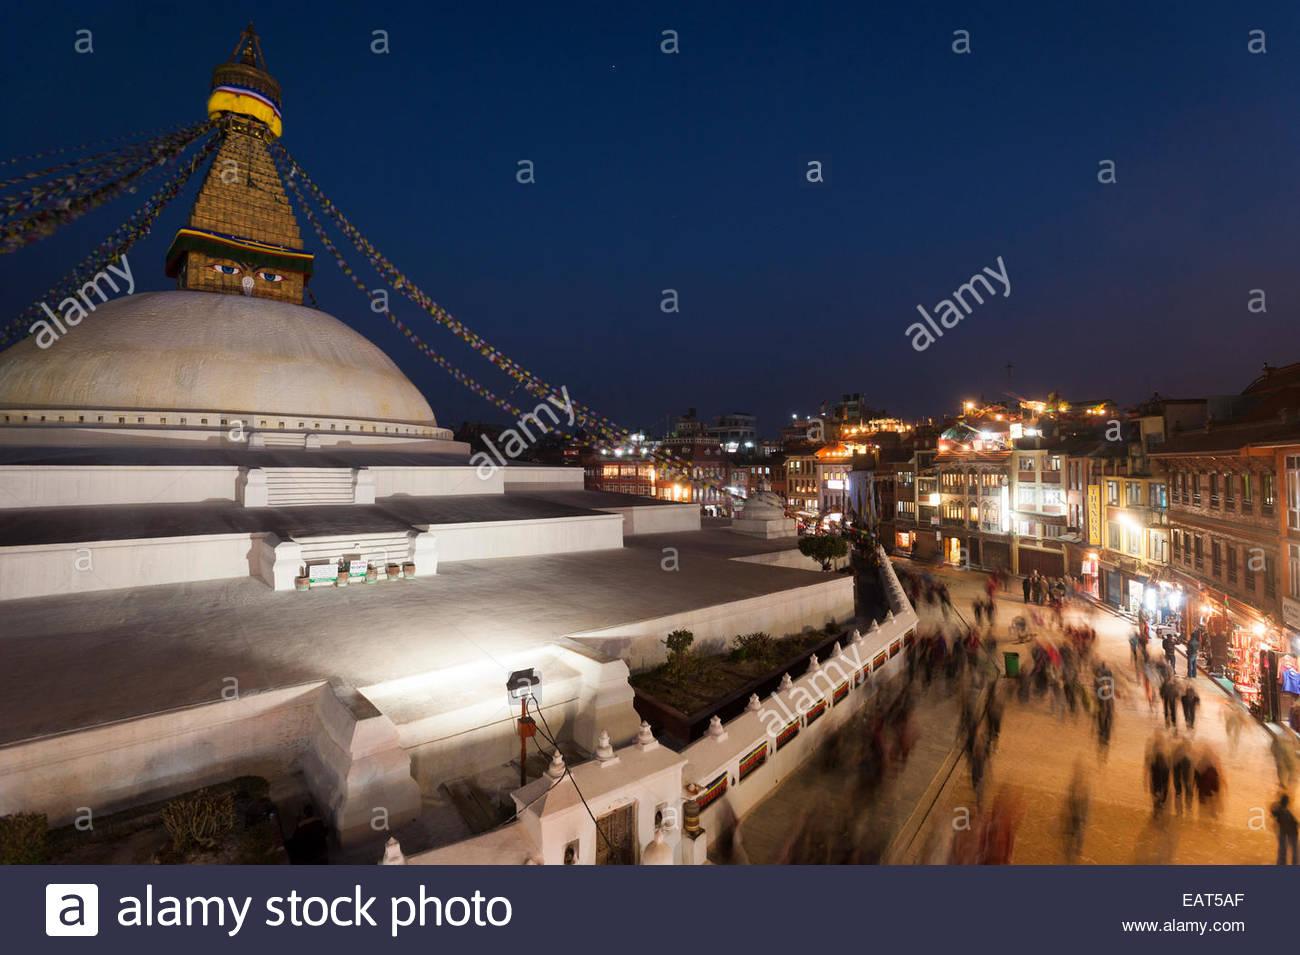 Tourists and pilgrims circle the Buddhist stupa of Baudda in Kathmandu - Stock Image